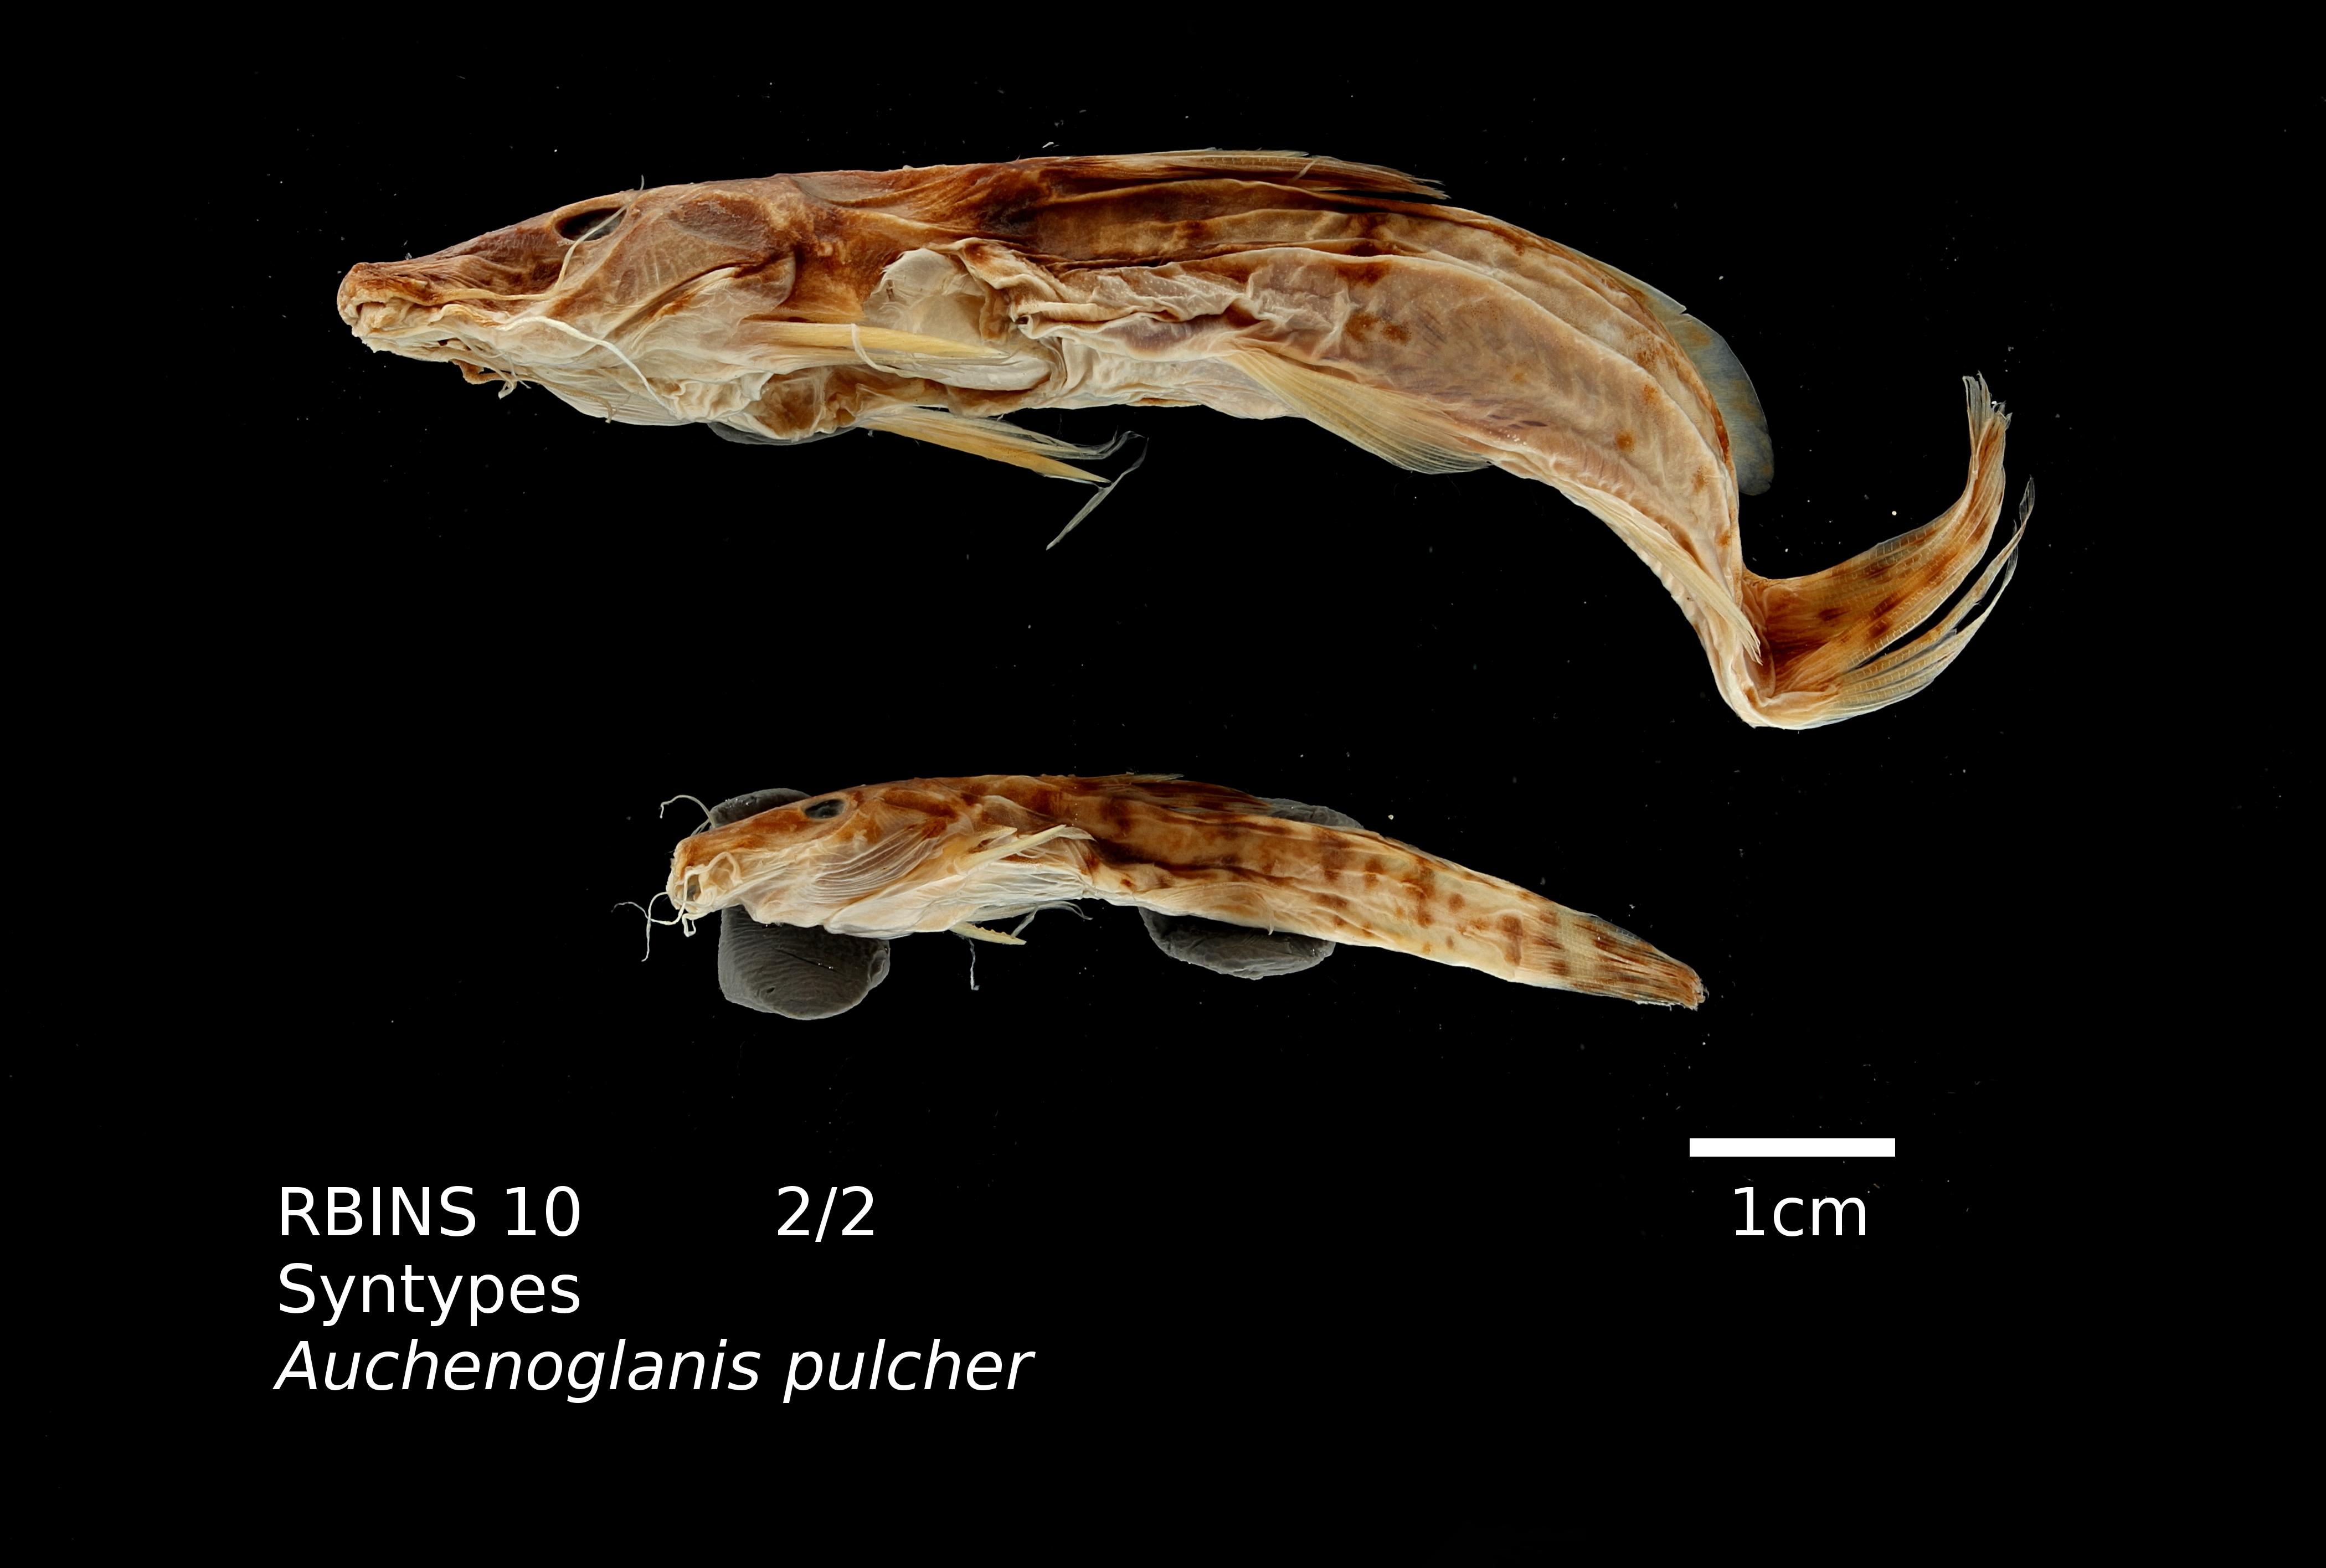 auchenoglanis pulcher RBINS 10 lat L.jpg